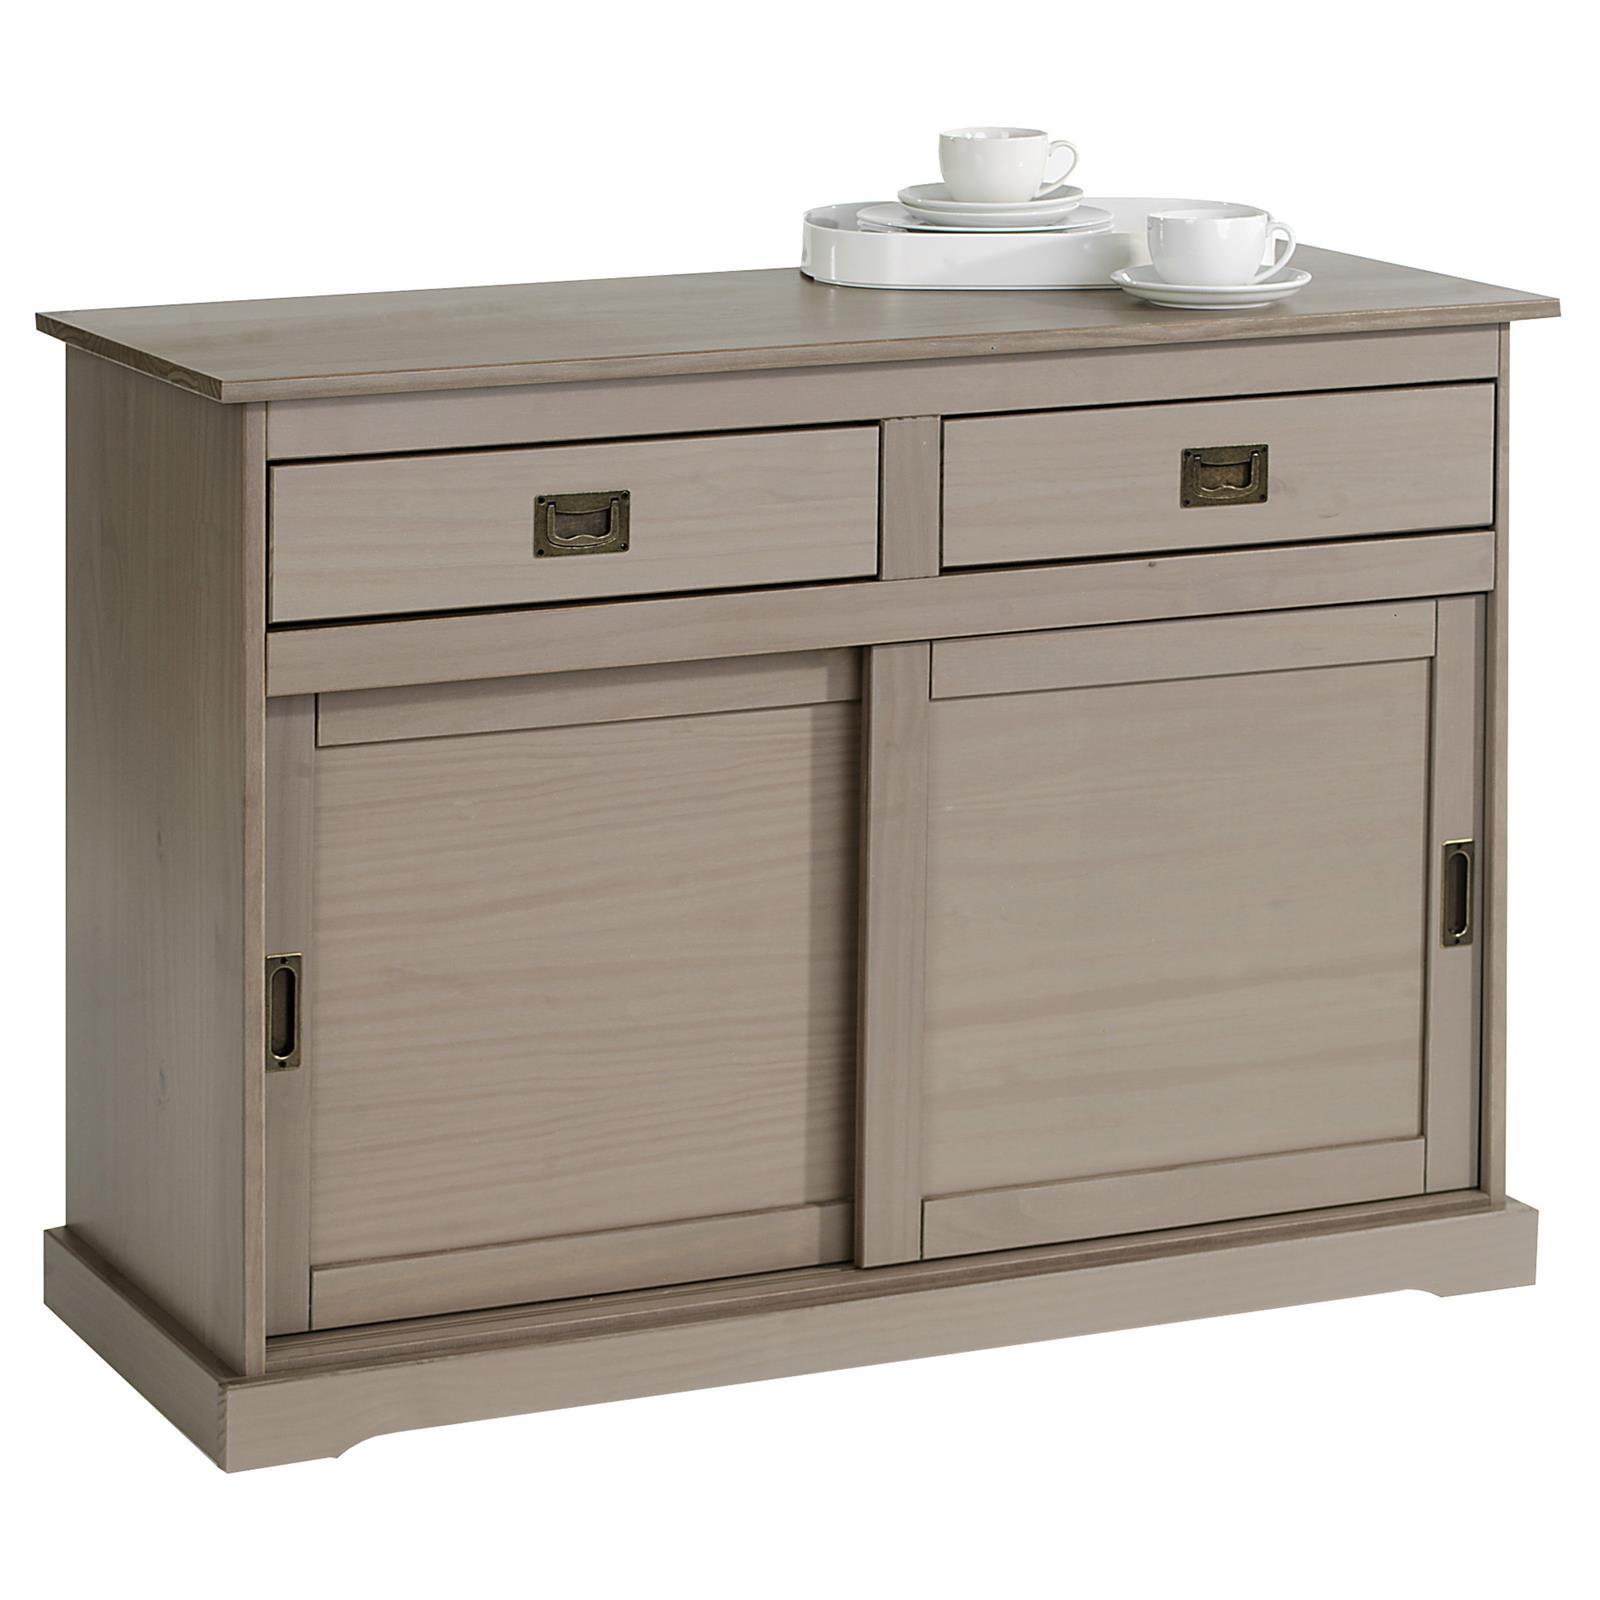 buffet savona en pin massif 2 tiroirs et 2 portes lasur taupe mobil meubles. Black Bedroom Furniture Sets. Home Design Ideas